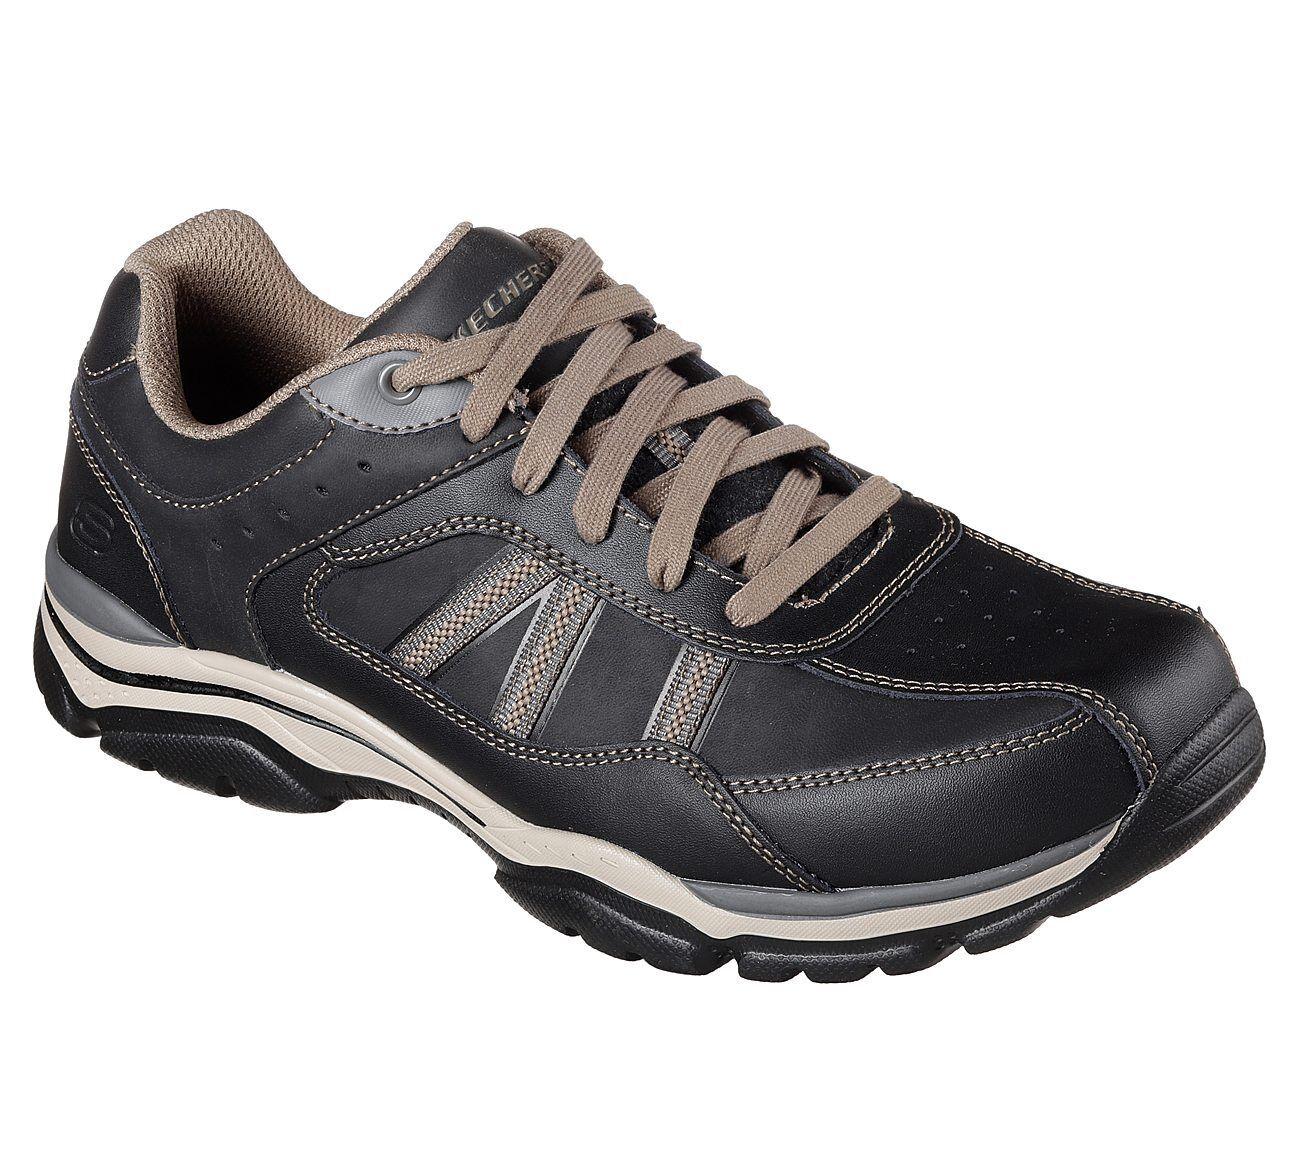 Schuh Leder Passform Bequeme Herren Skechers 65418 Schnürer